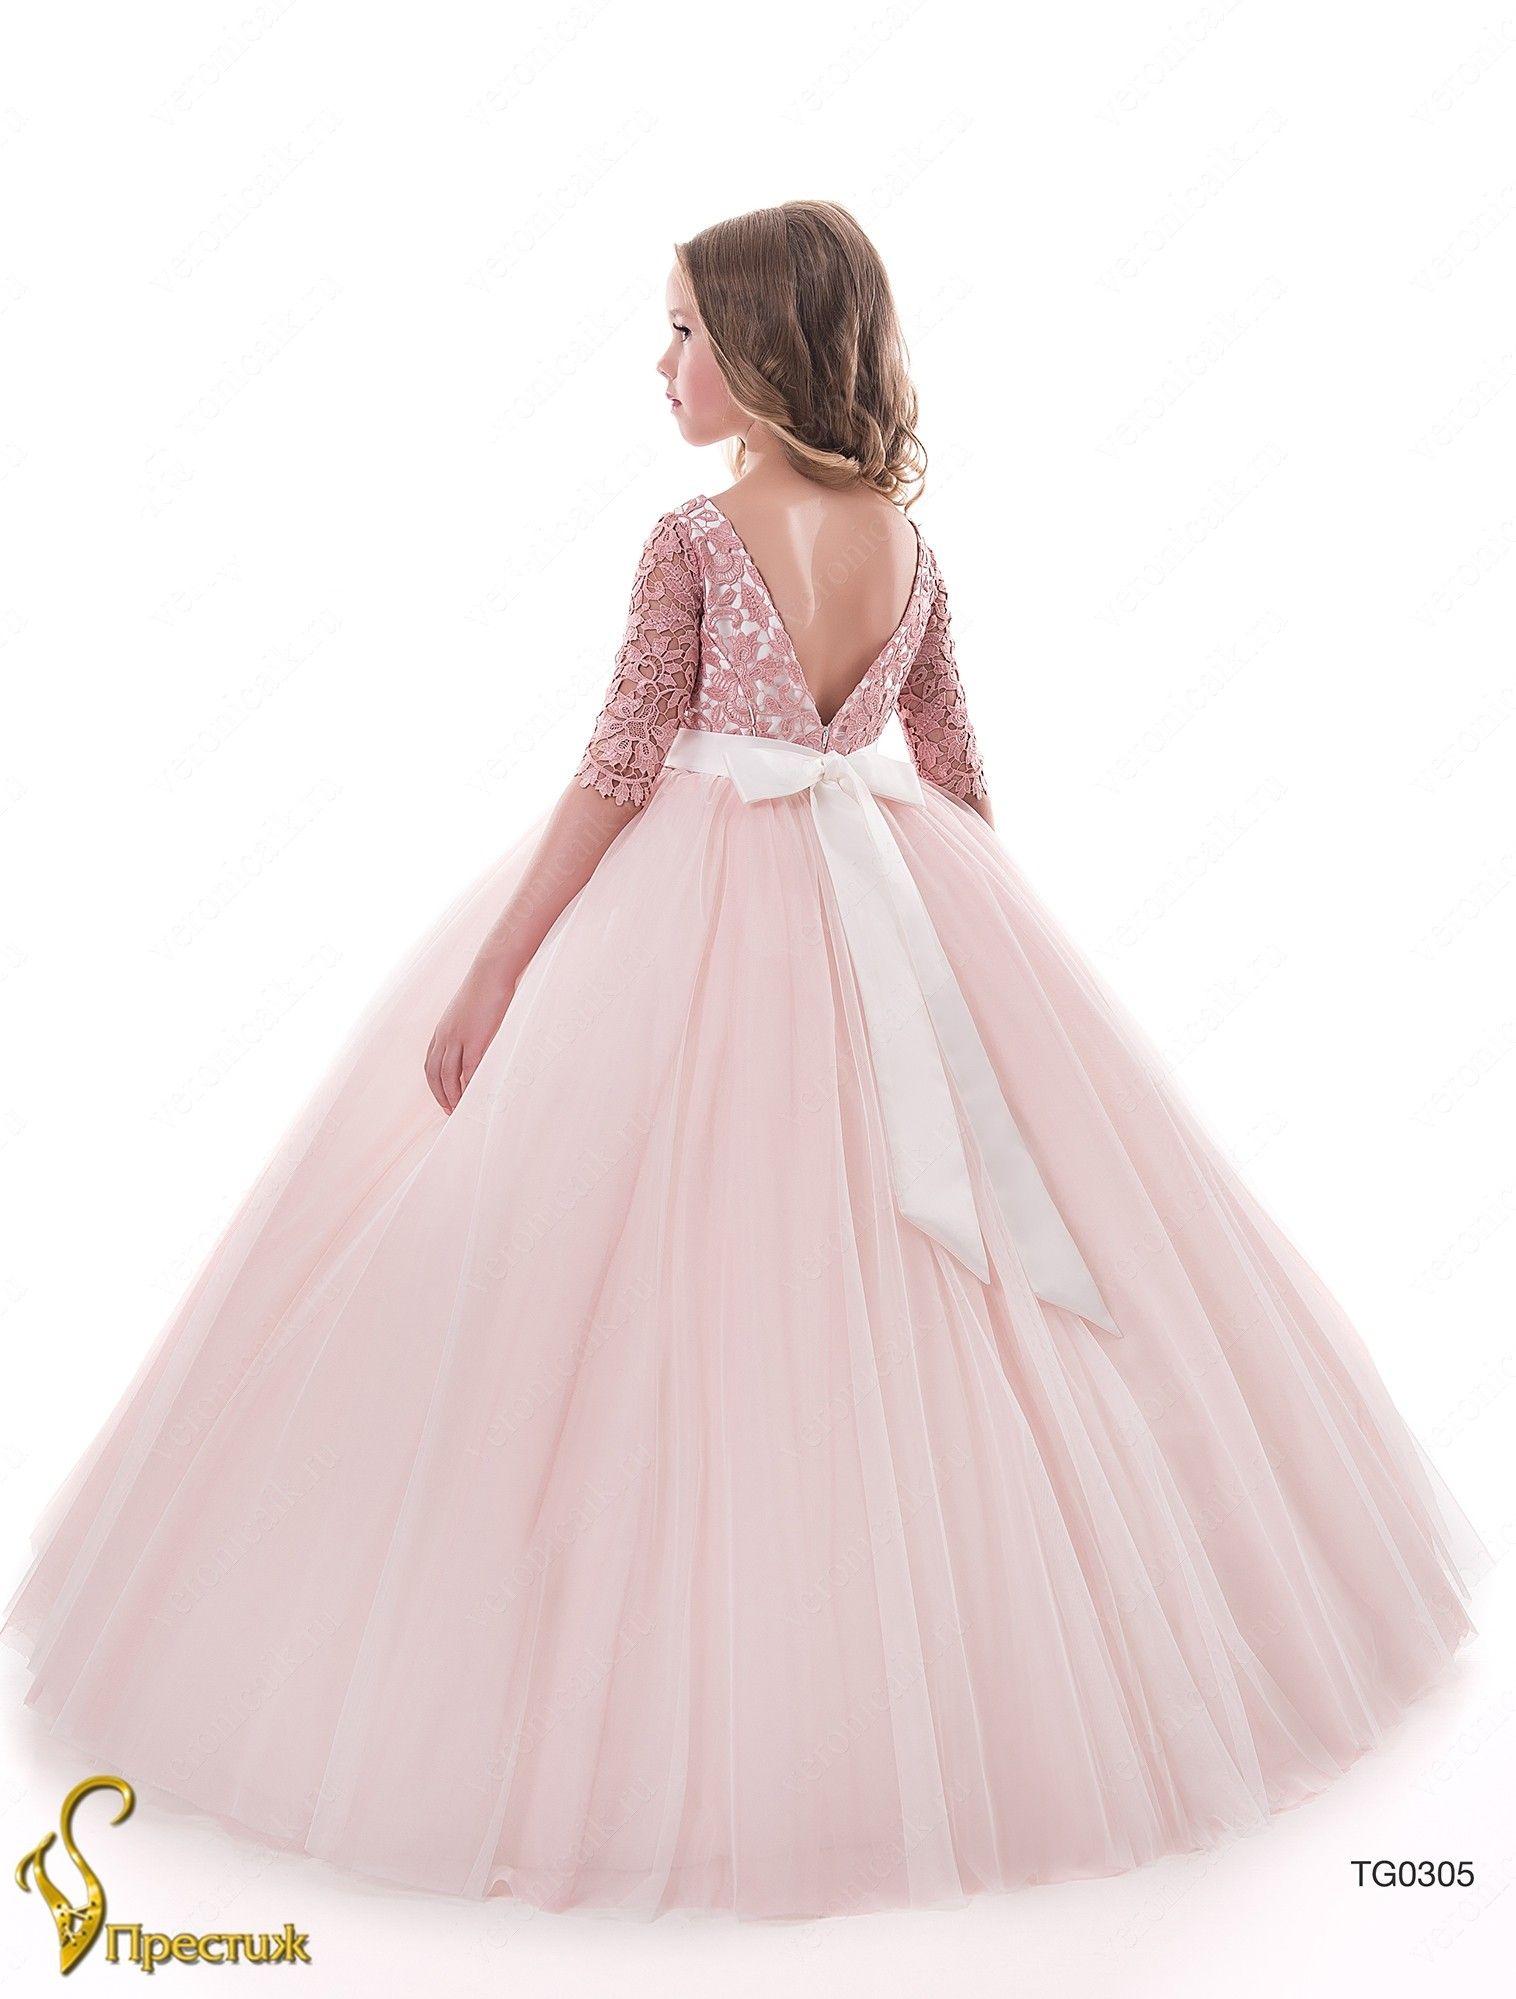 Blush Lace Backless 2017 Arabo Flower Girl Abiti Ball Gown Bambino Abiti da sposa Vintage Little Girl Abiti da spettacolo